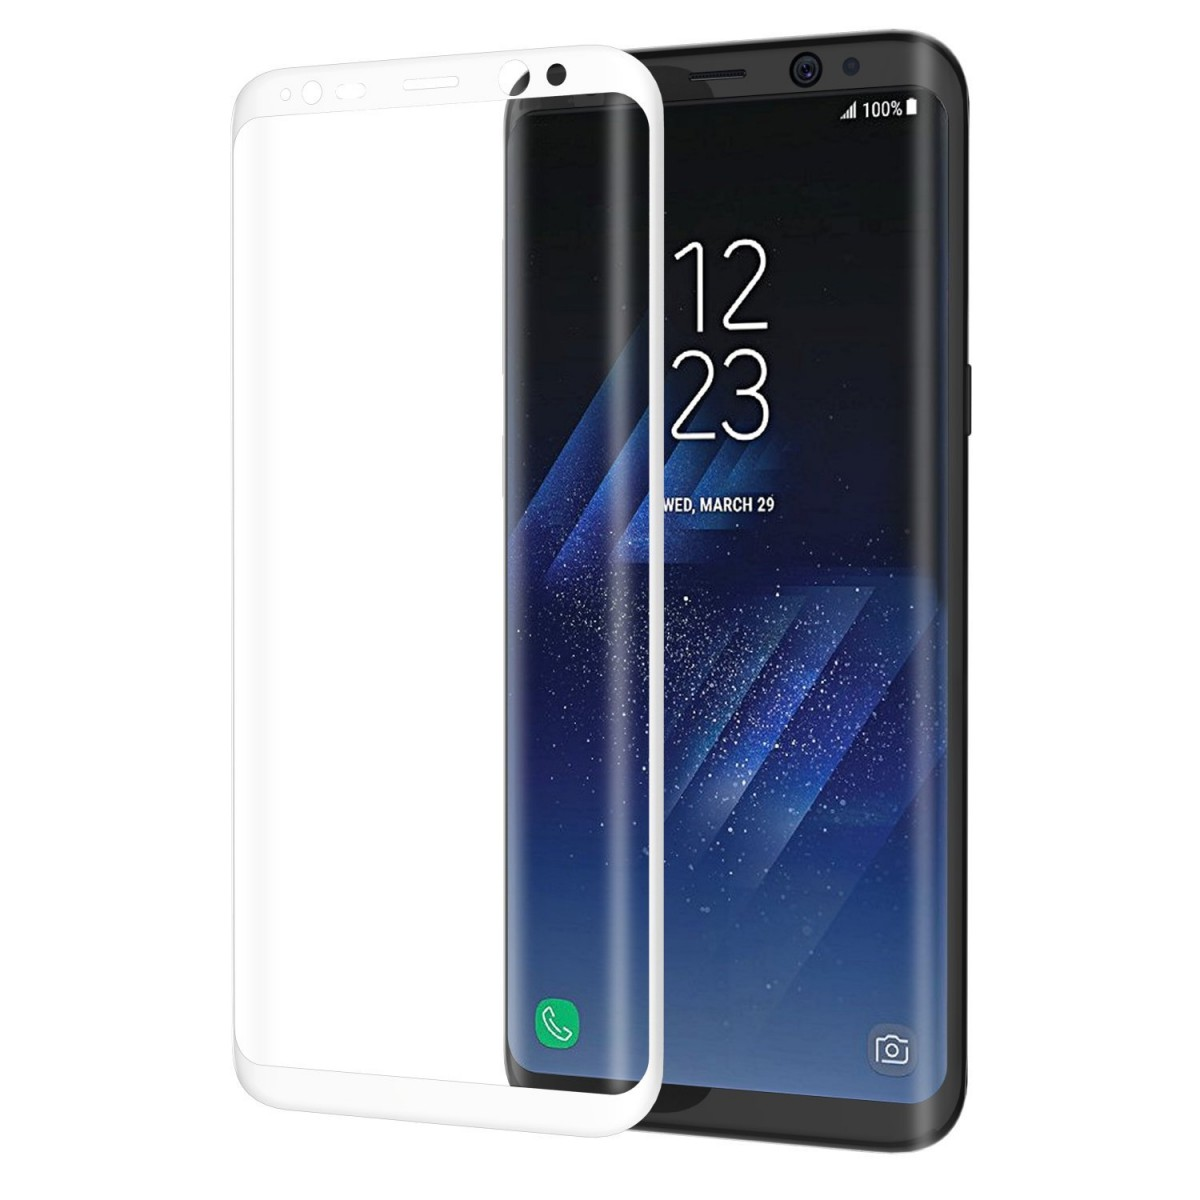 NONAME 3D tvrzené sklo Samsung Galaxy S8 (G950F), silver 8921251658029